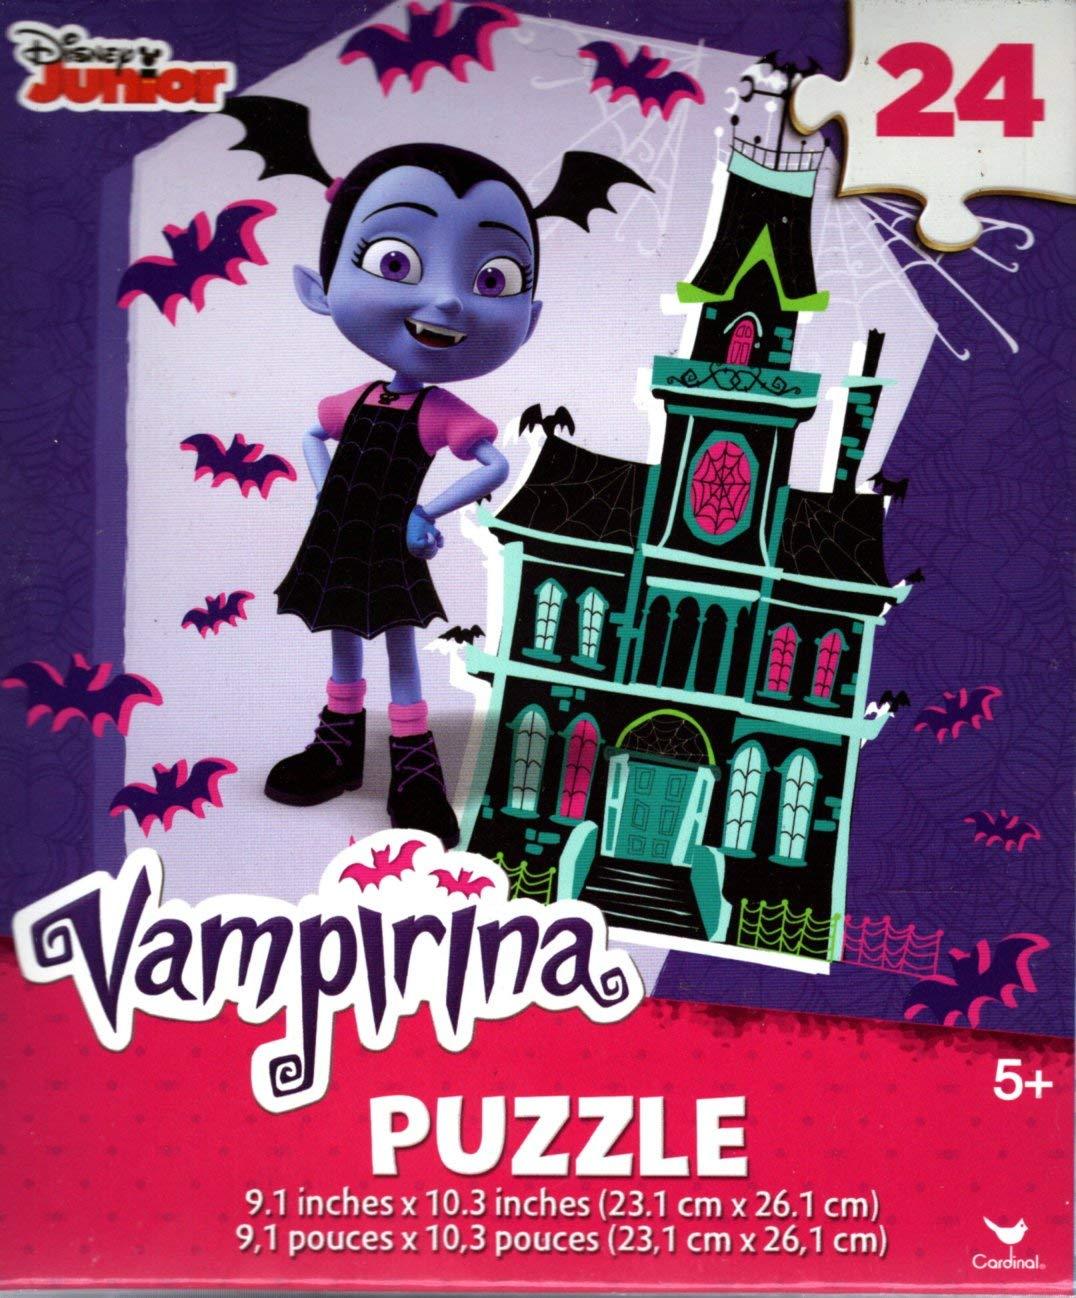 Set of 2 - v4 Cardinal Industries 24 Pieces Jigsaw Puzzle - Disney Junior Vampirina